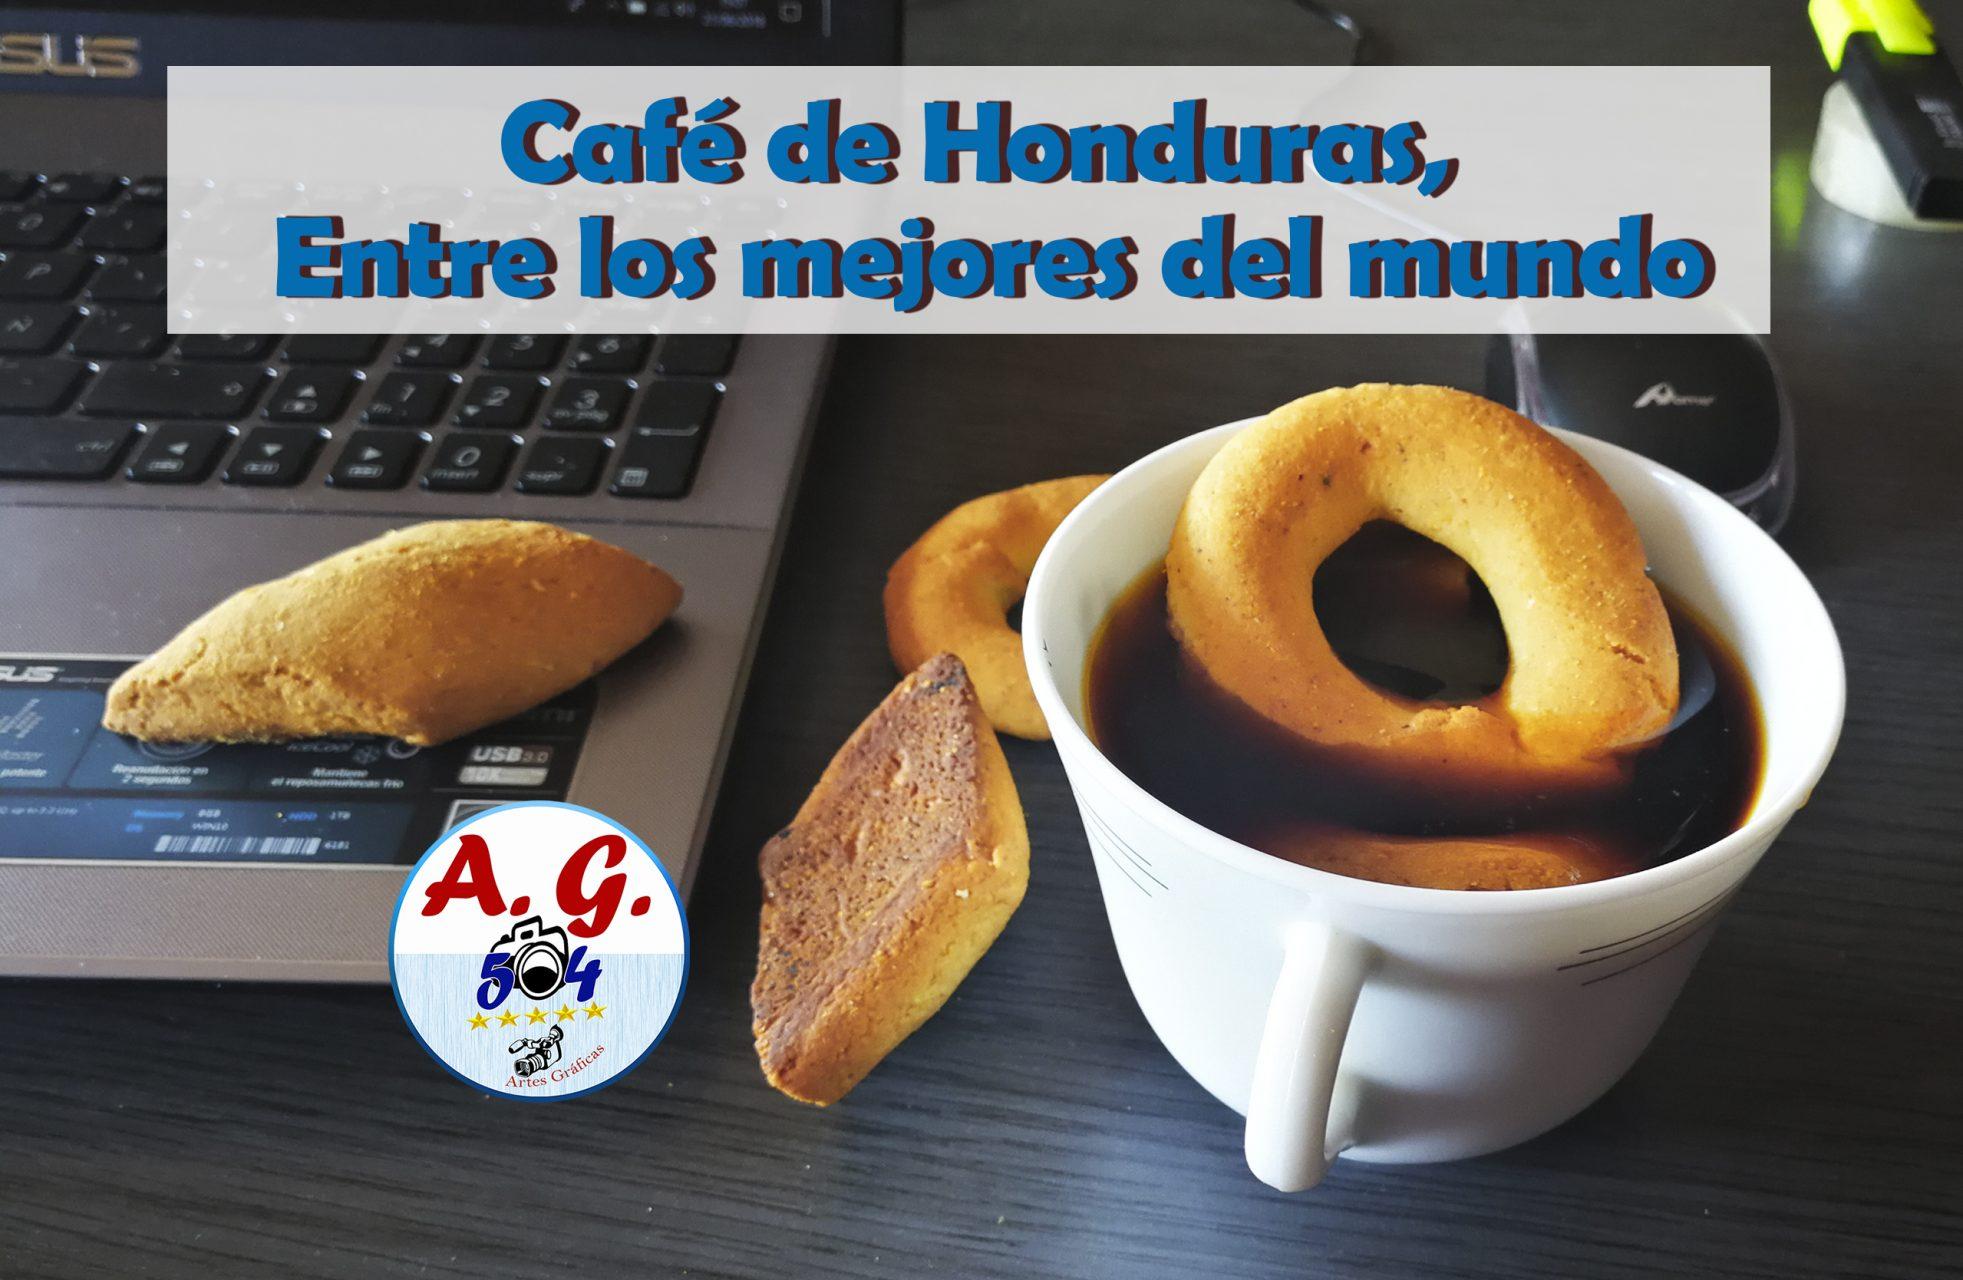 Café con rosquilla delicia hondureña